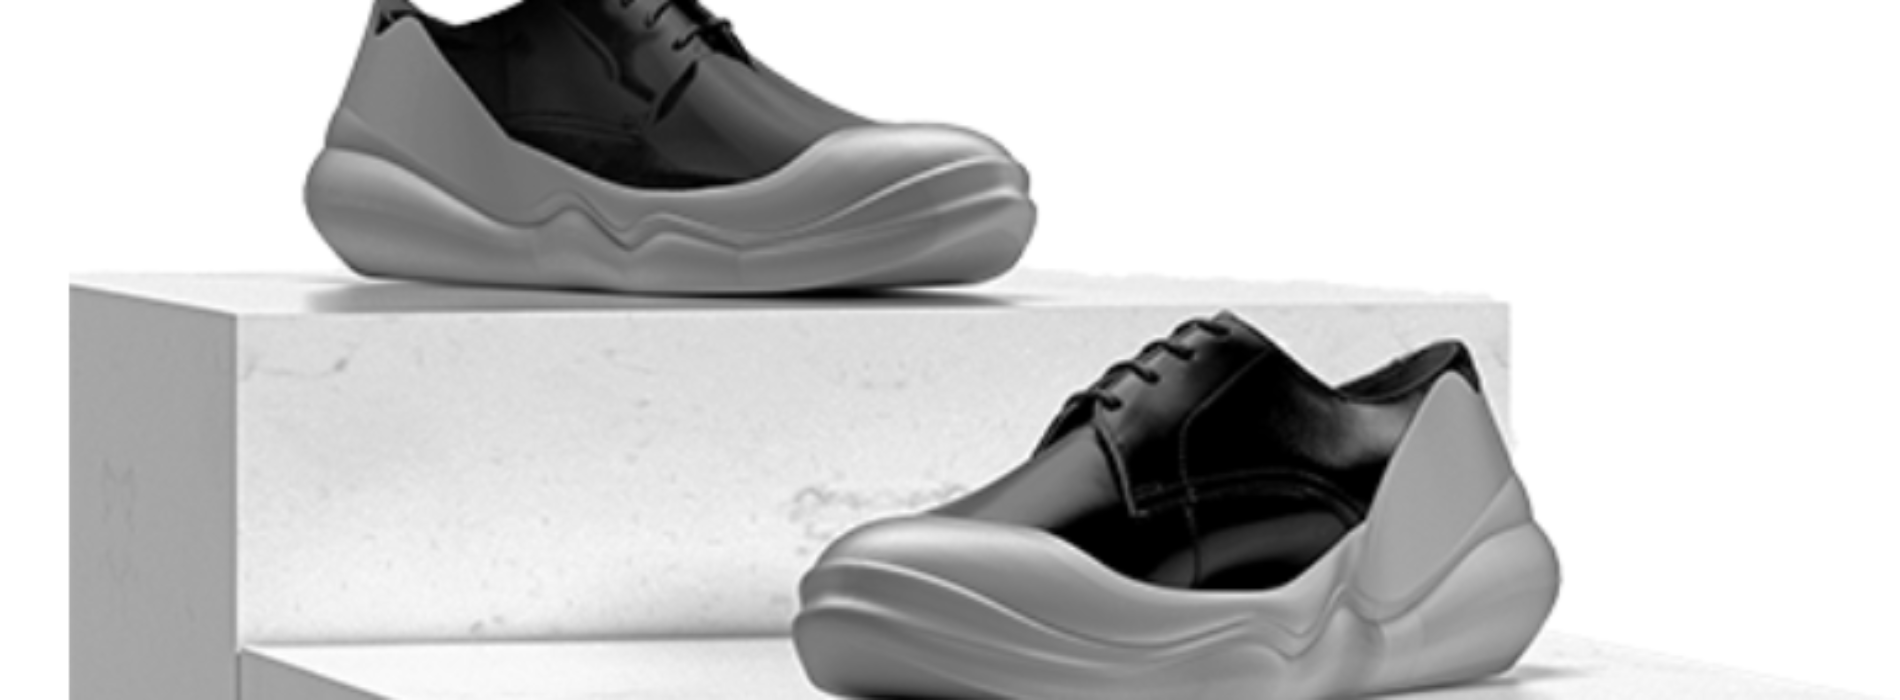 Eco_Shoes, nascono in Officina le calzature made in Vanvitelli